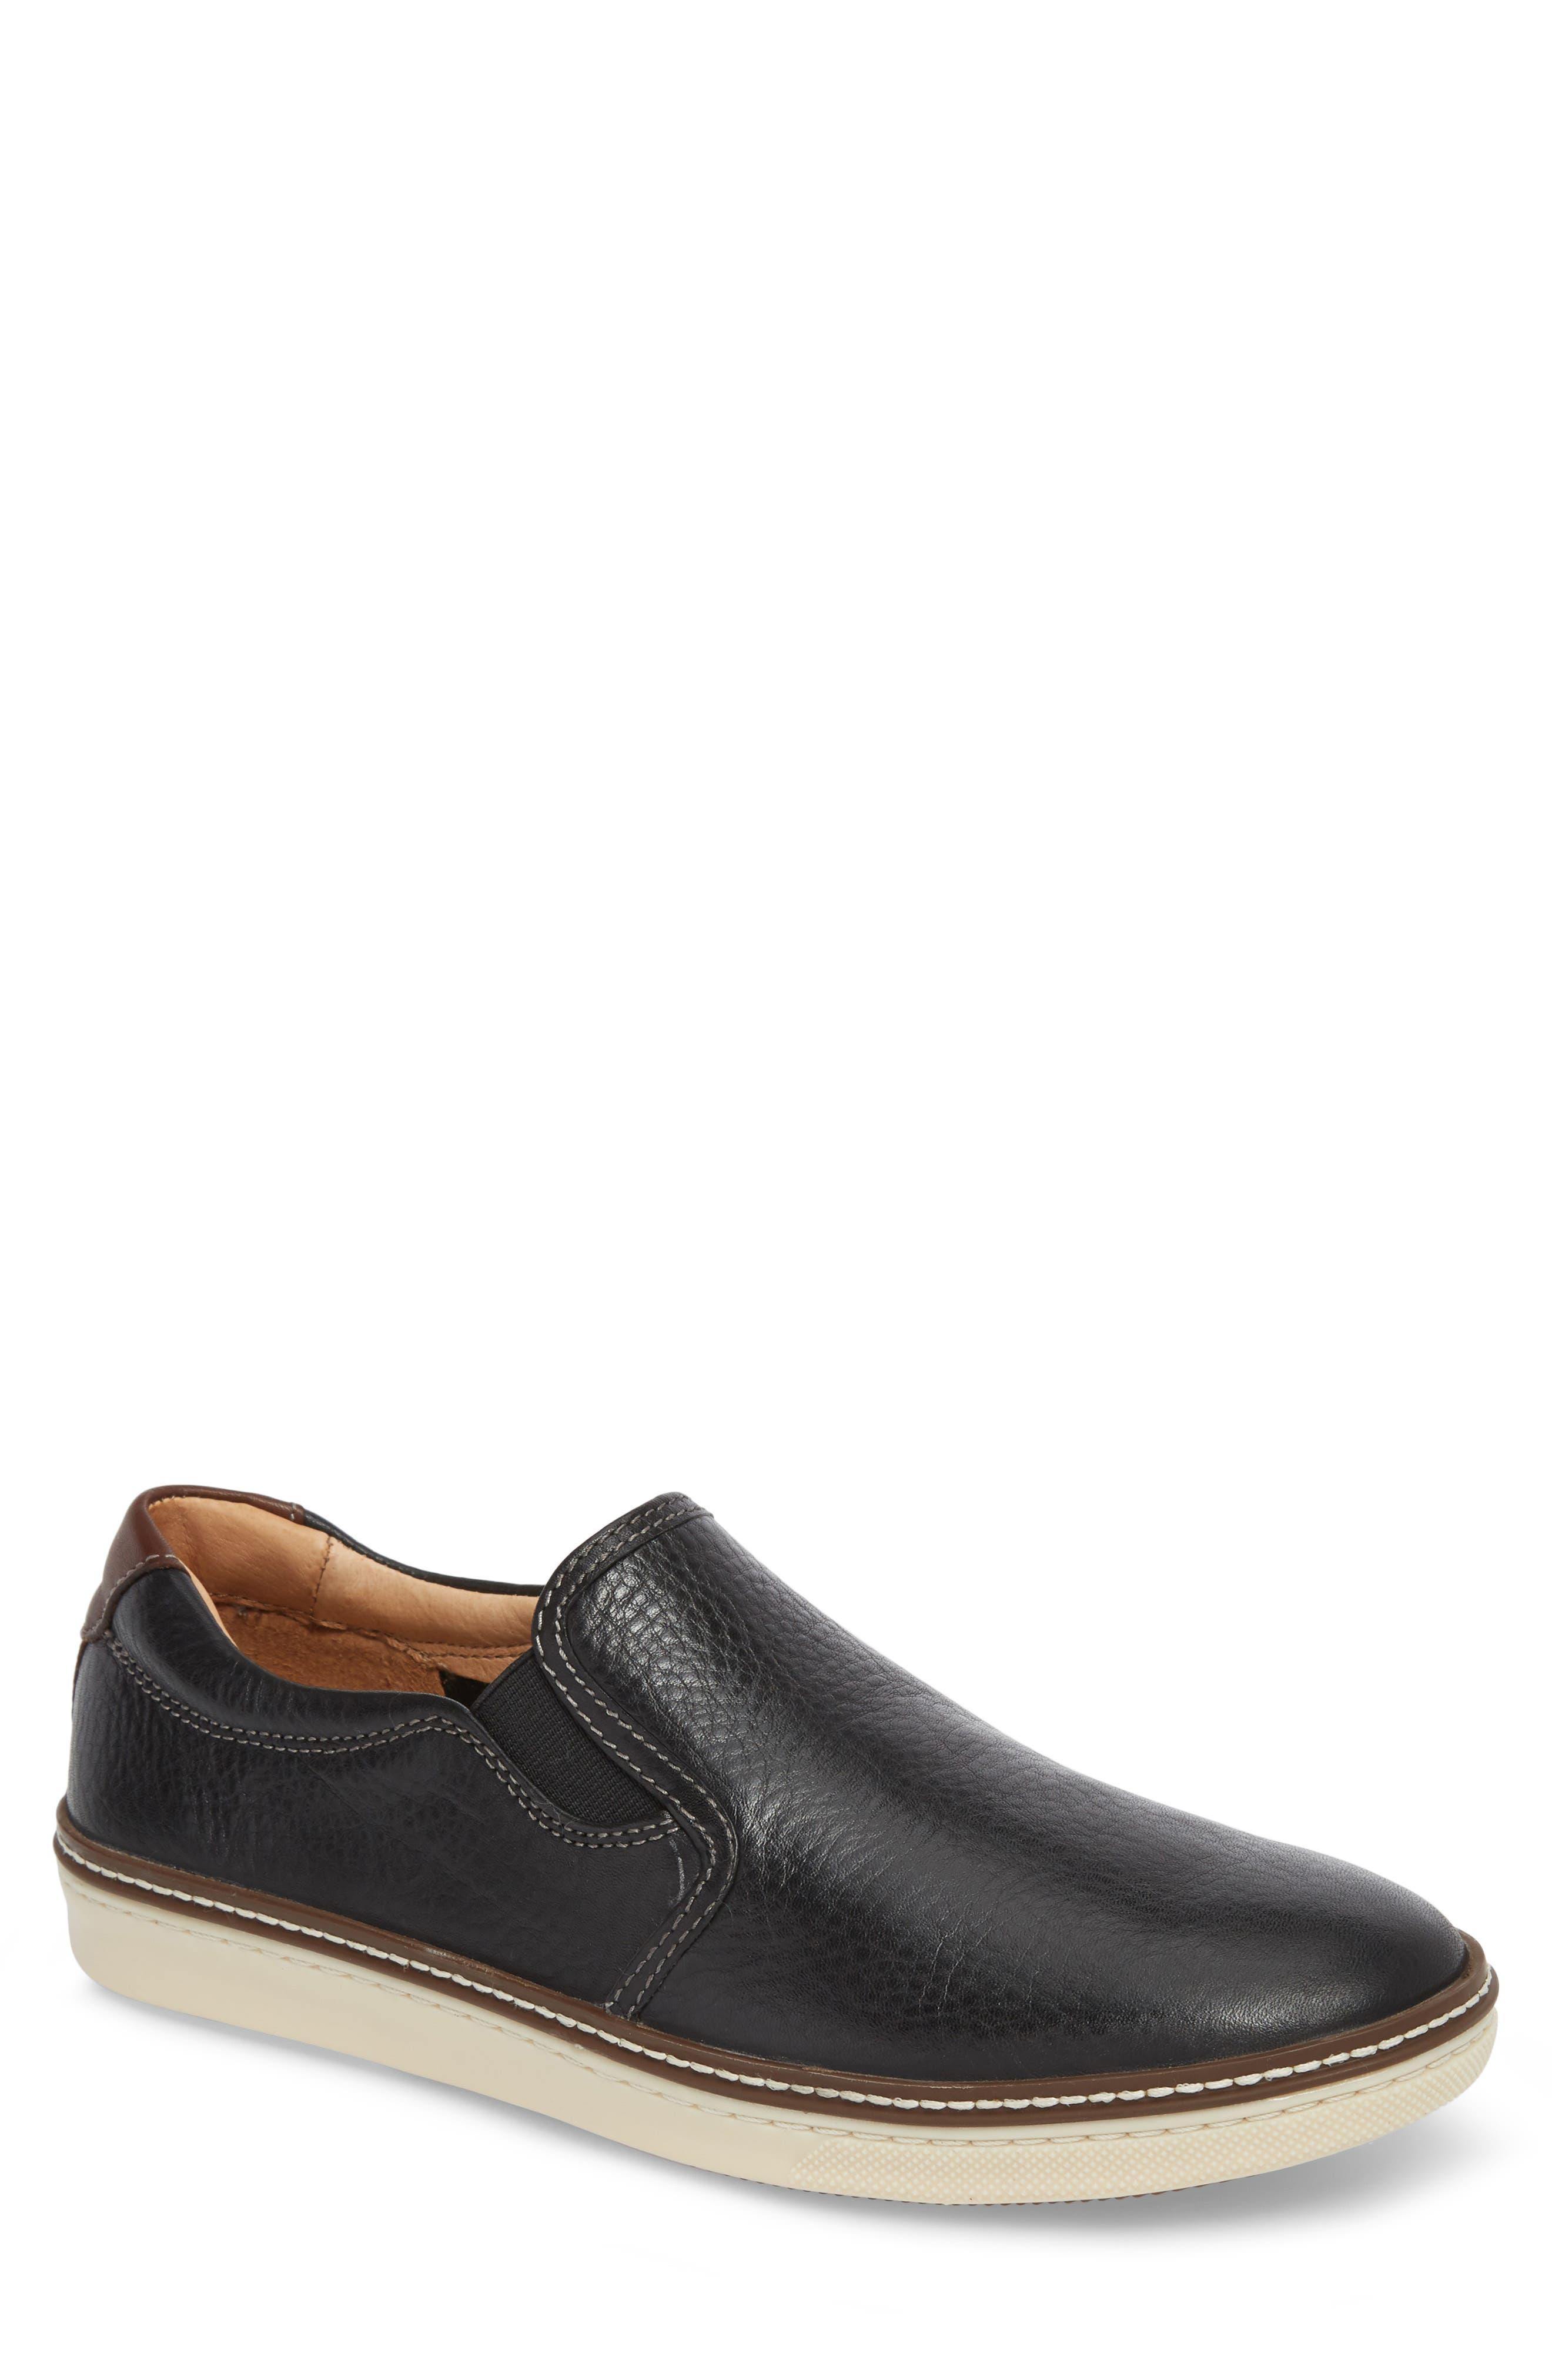 McGuffey Slip-On Sneaker,                             Main thumbnail 1, color,                             Black Leather